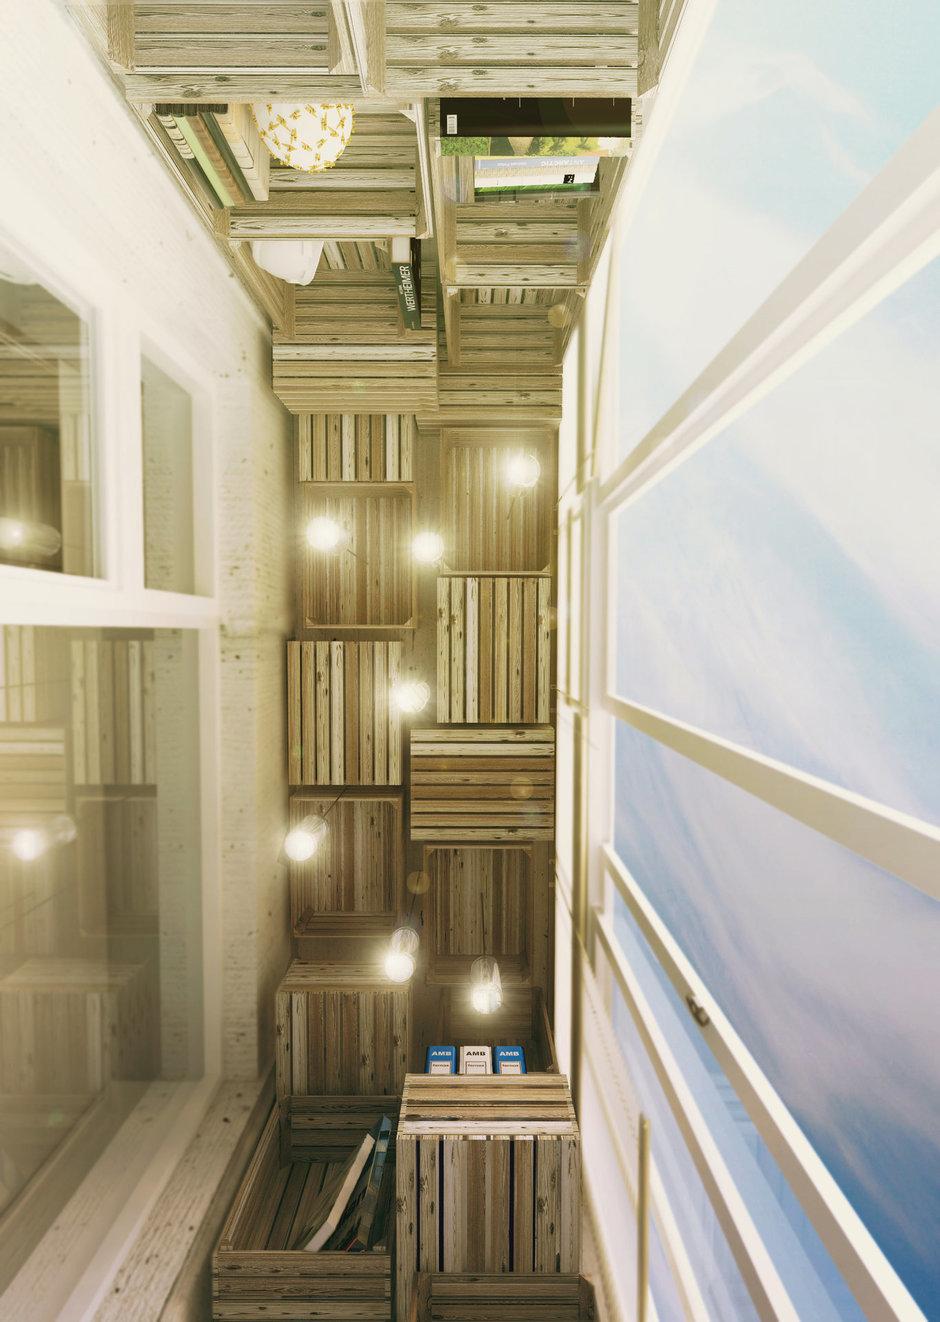 Фотография: Балкон, Терраса в стиле Лофт, Интерьер комнат – фото на InMyRoom.ru